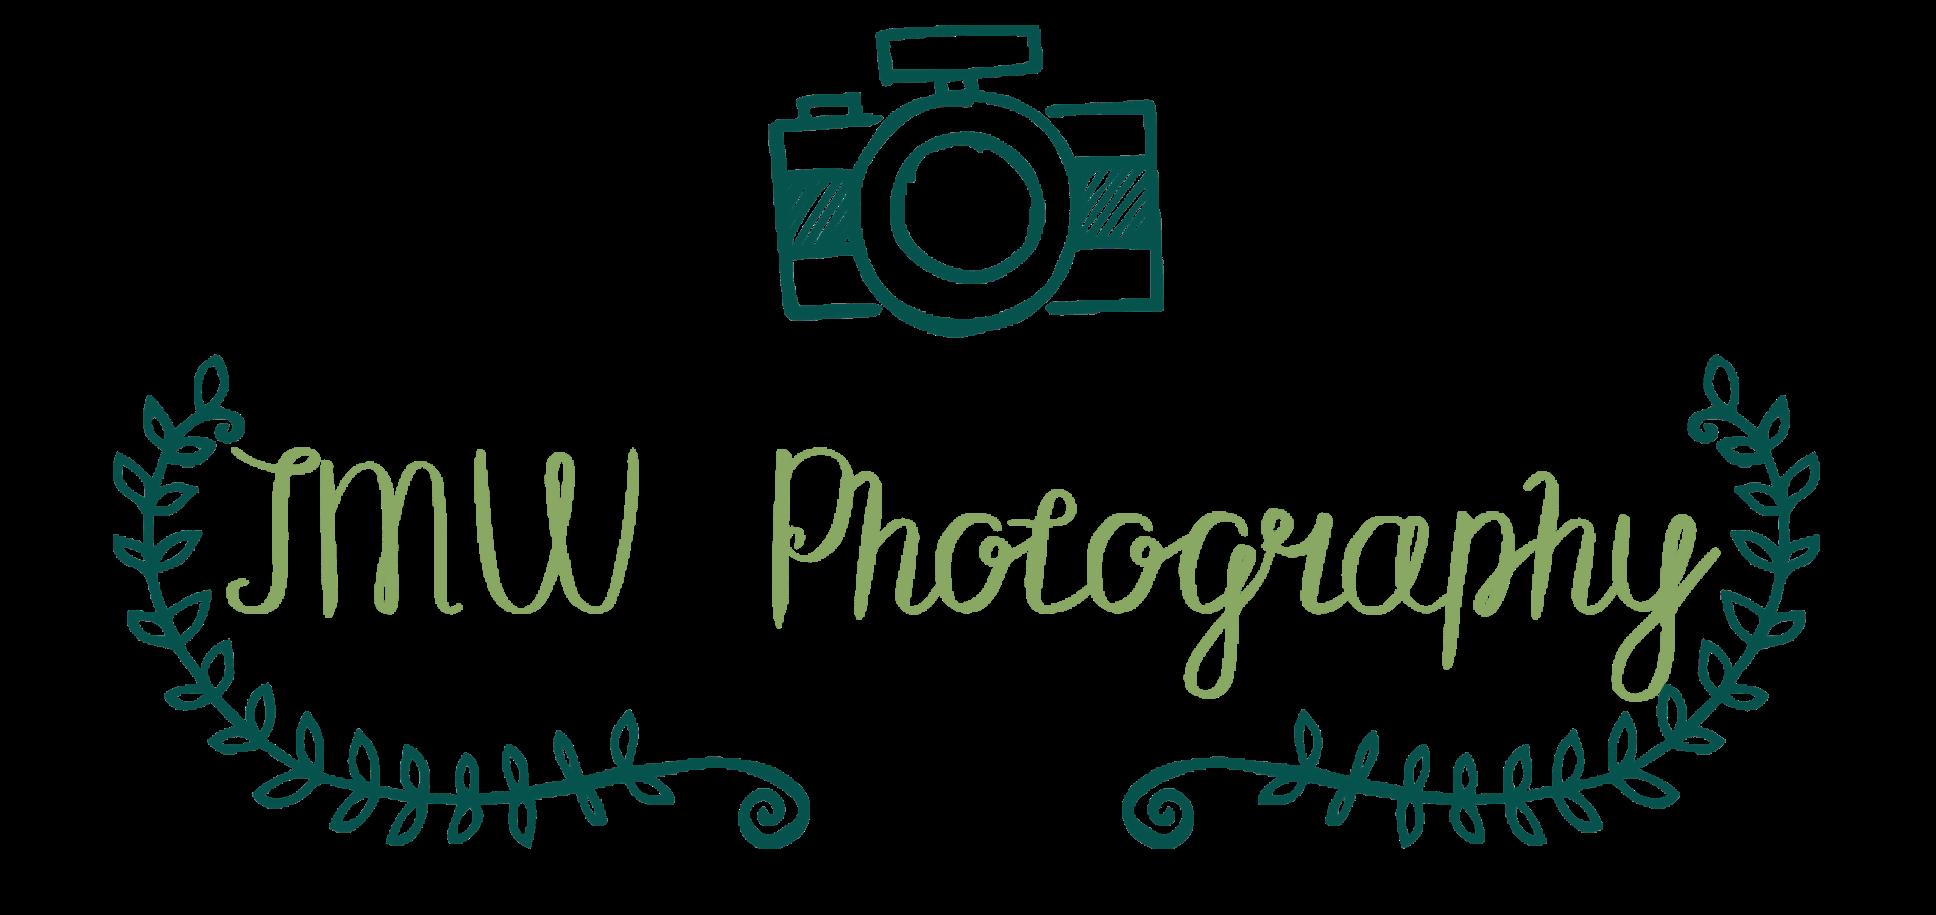 JMW Photography